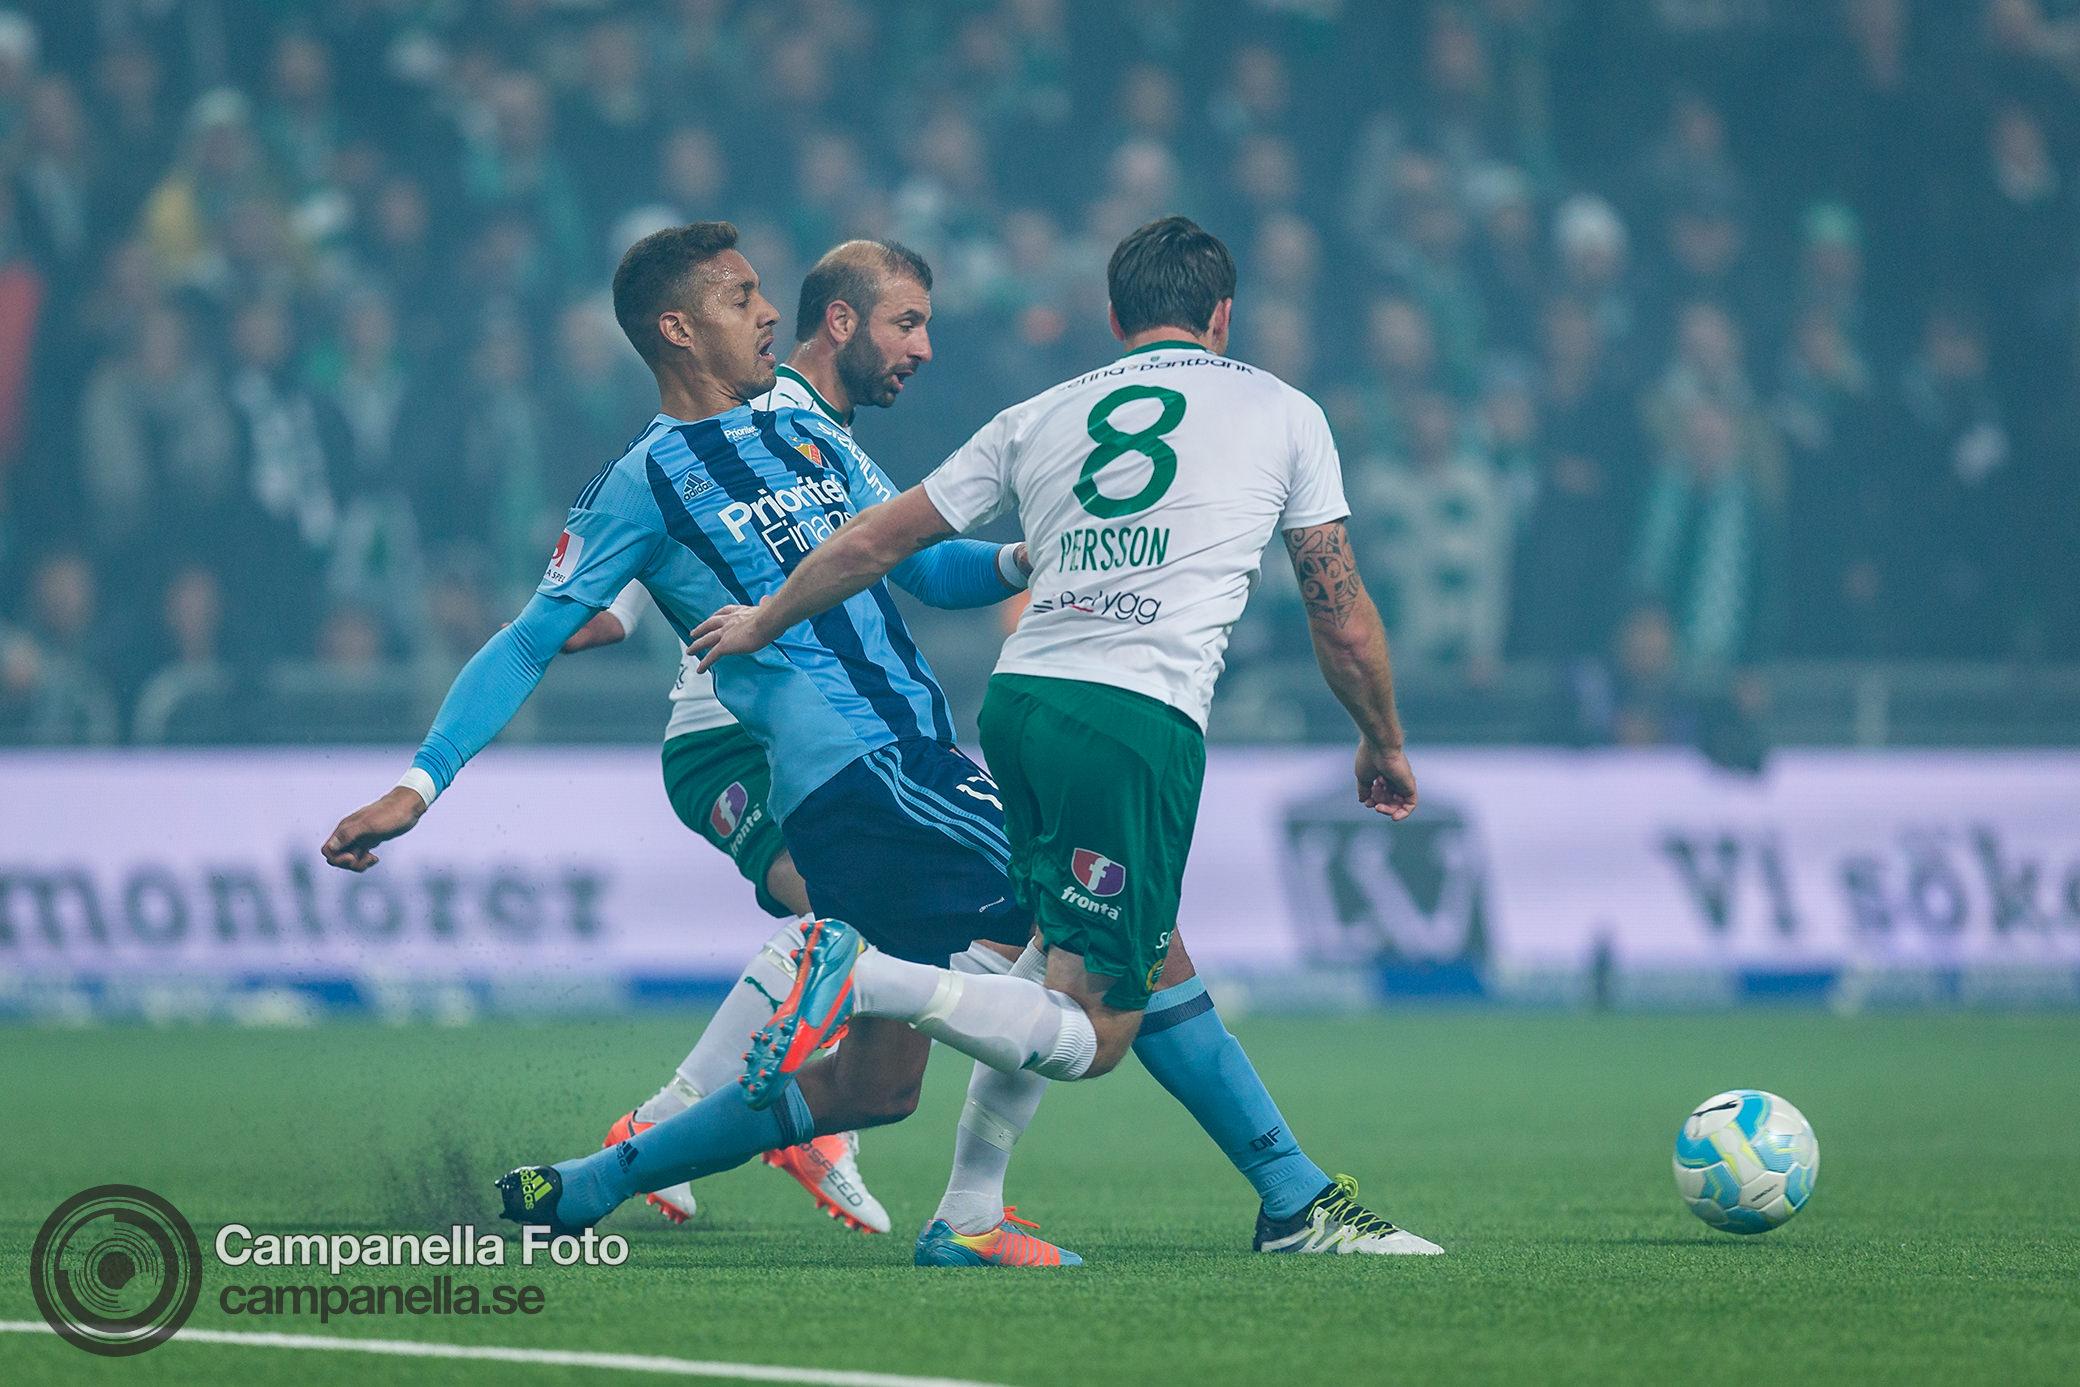 Hammarby stage unbelievable derby comeback - Michael Campanella Photography